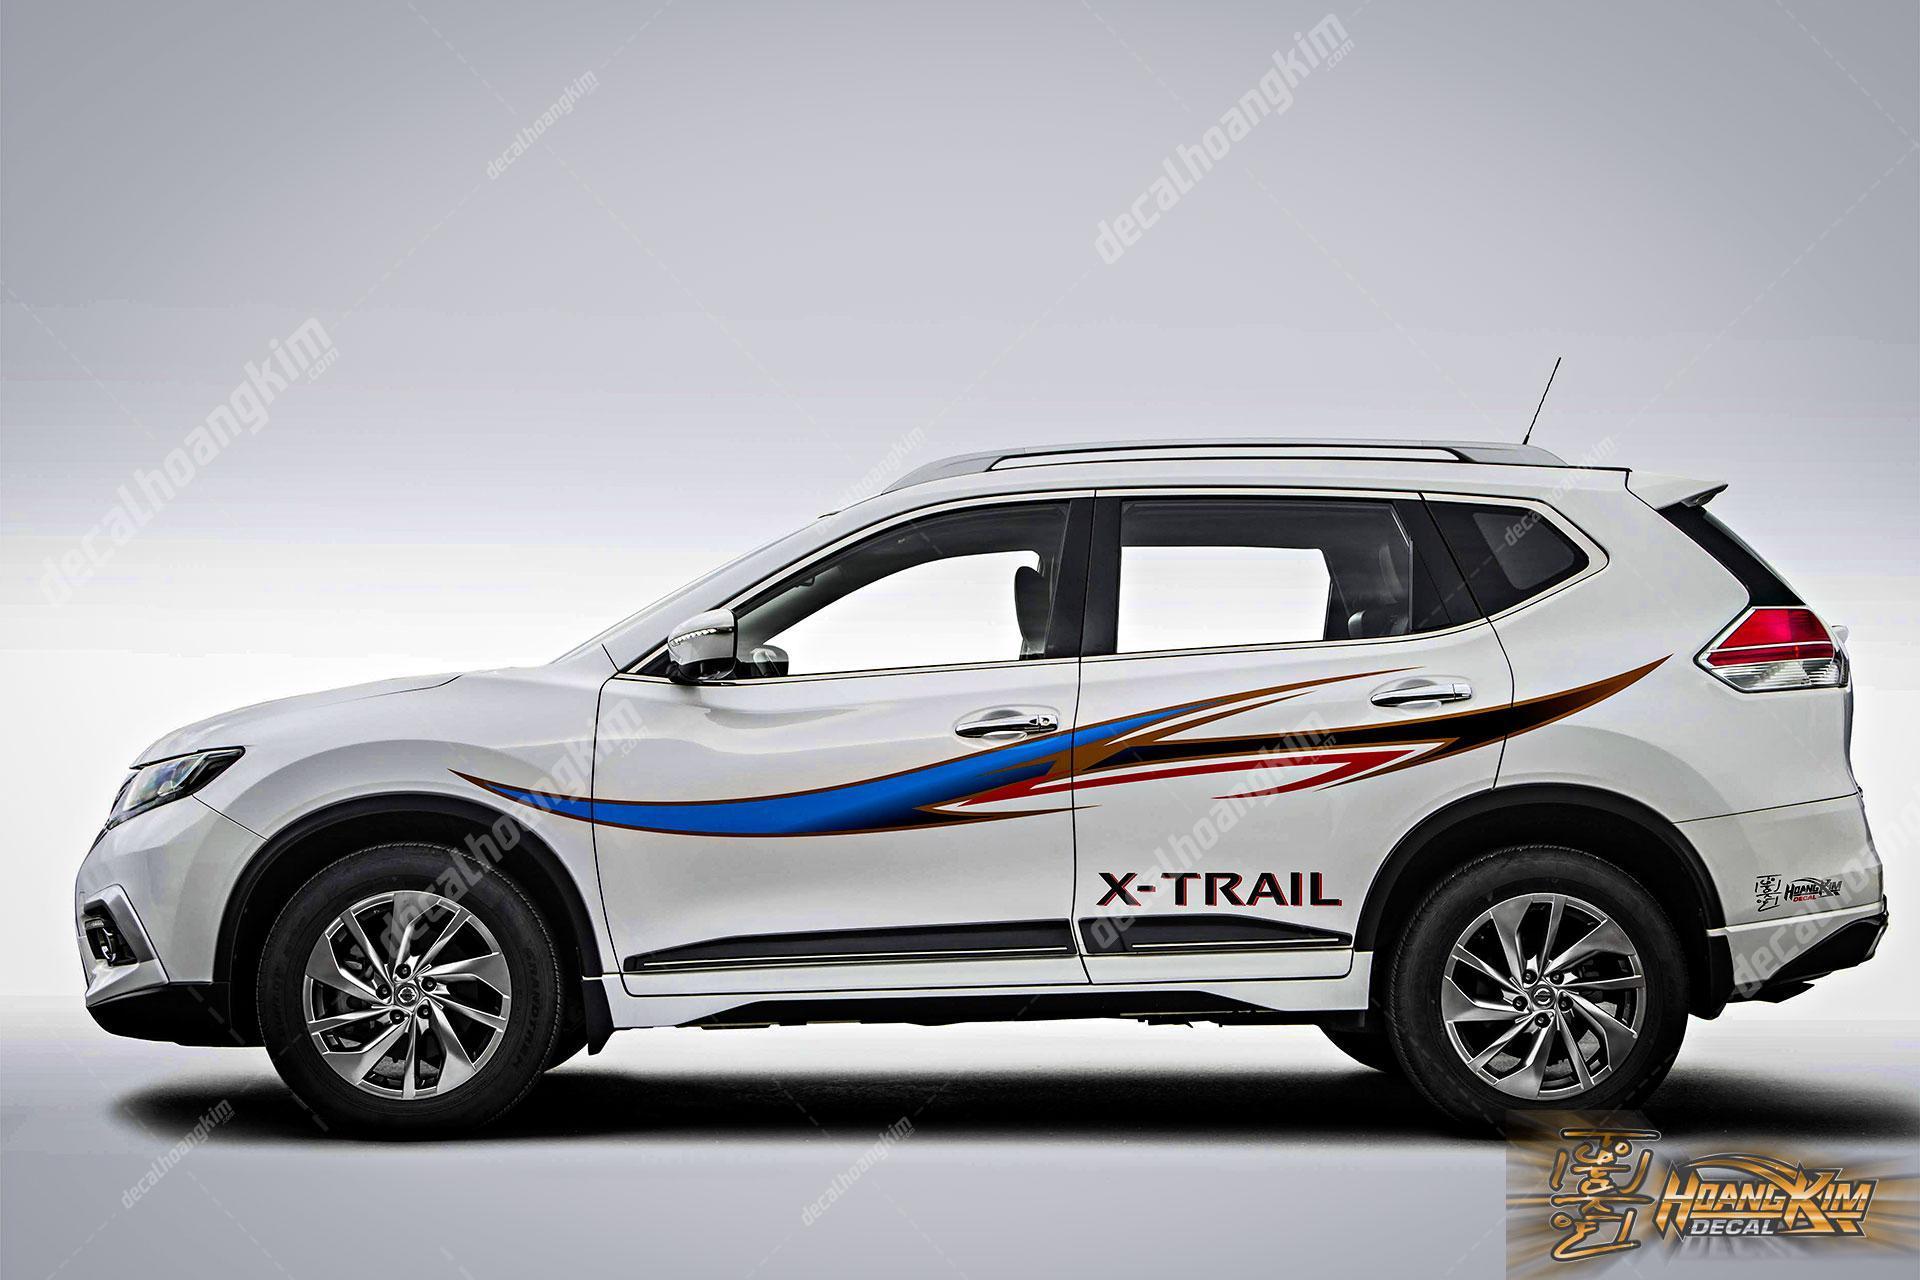 https://hoangkims5.blob.core.windows.net/otohoangkimzag152hg18/Tem-xe-Nissan-X-Trail-NXT009.jpg